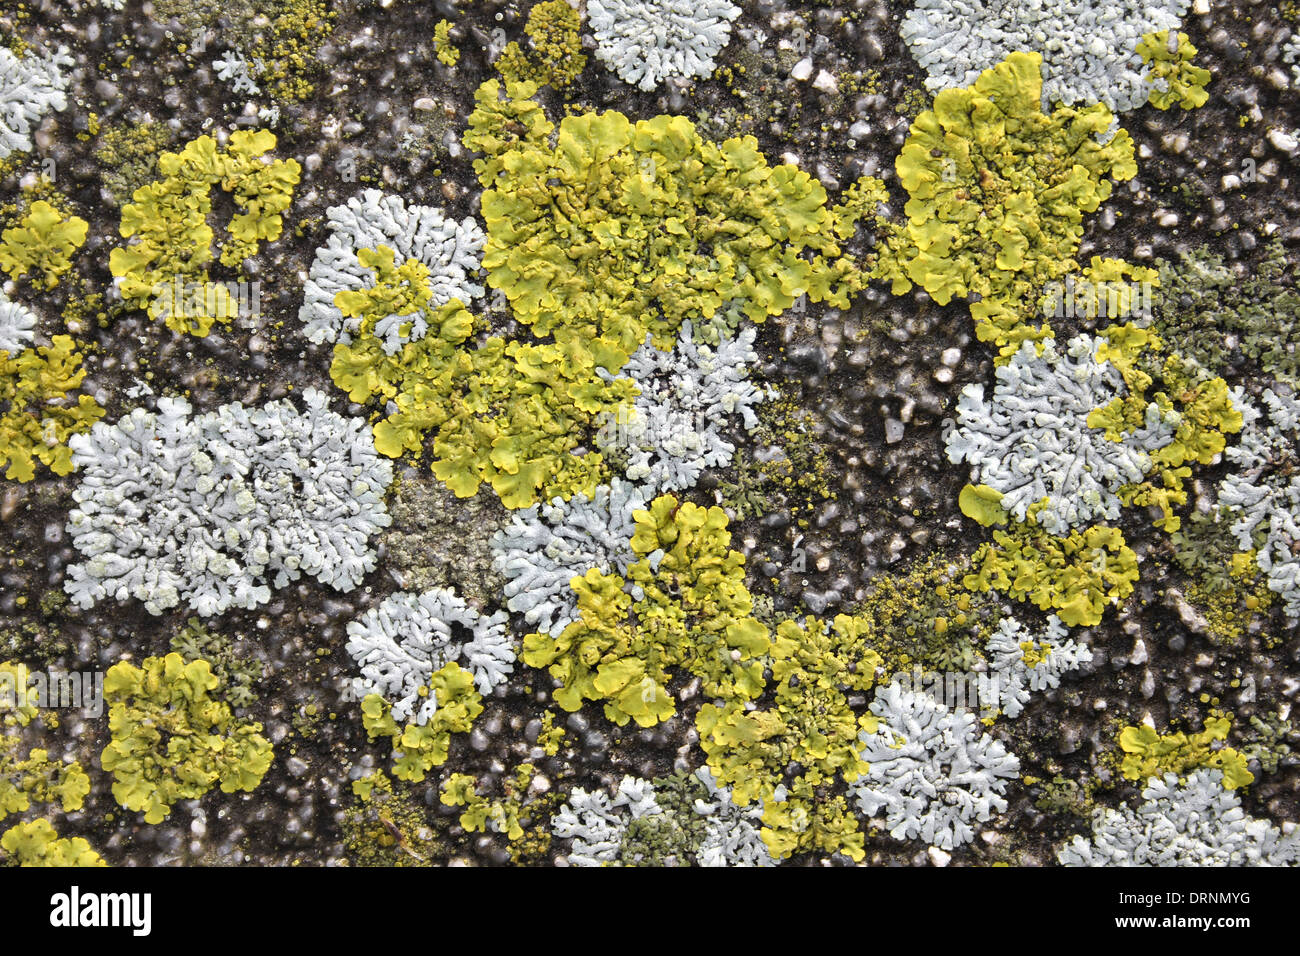 Encrusting Lichens On Stone - Stock Image